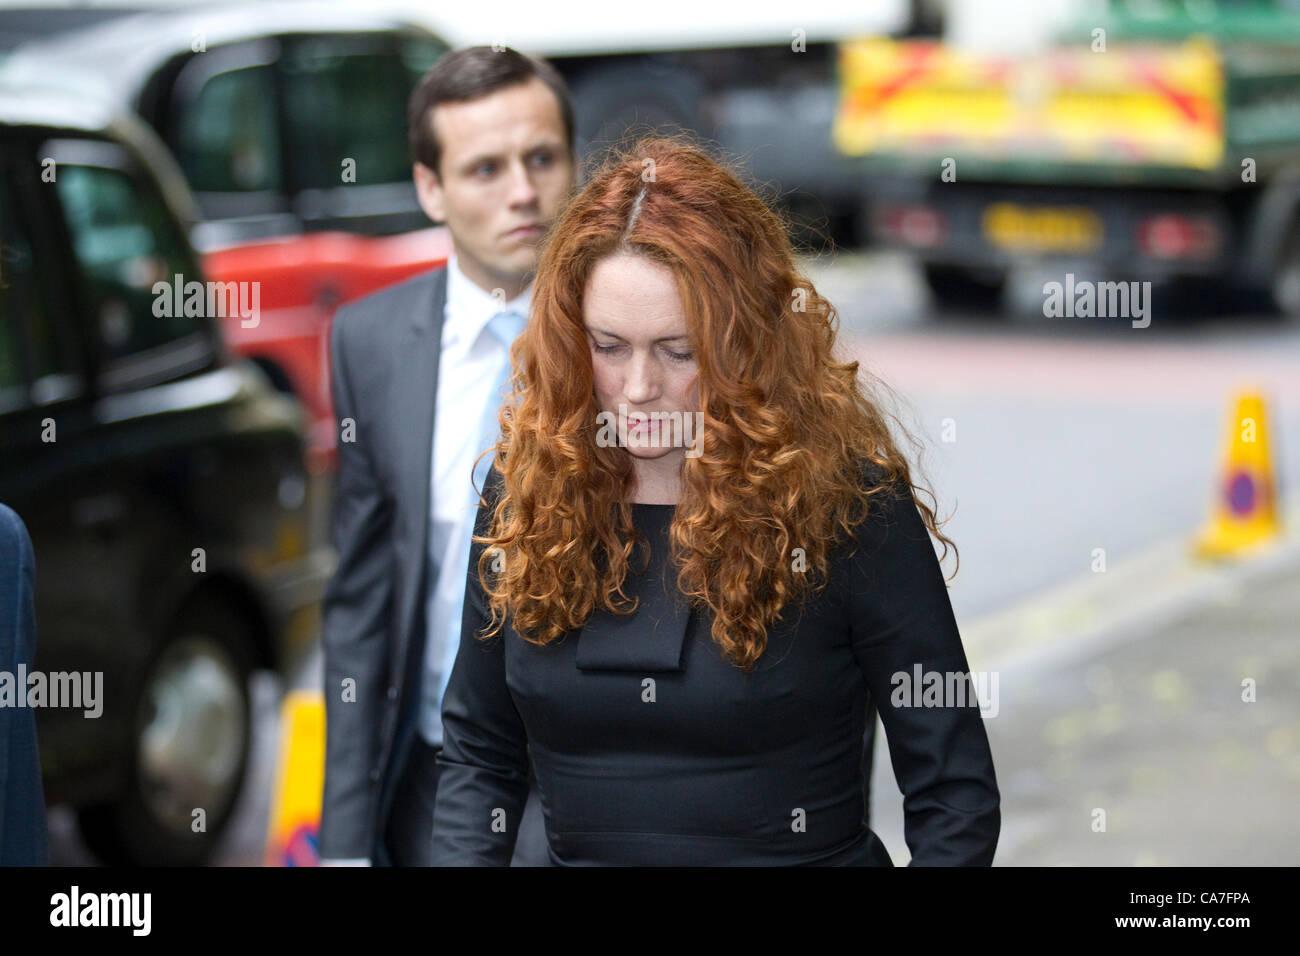 Southwark Crown Court, London, UK. 22.06.2012 Rebekah Brooks arriving today at Southwark Crown Court. The former - Stock Image